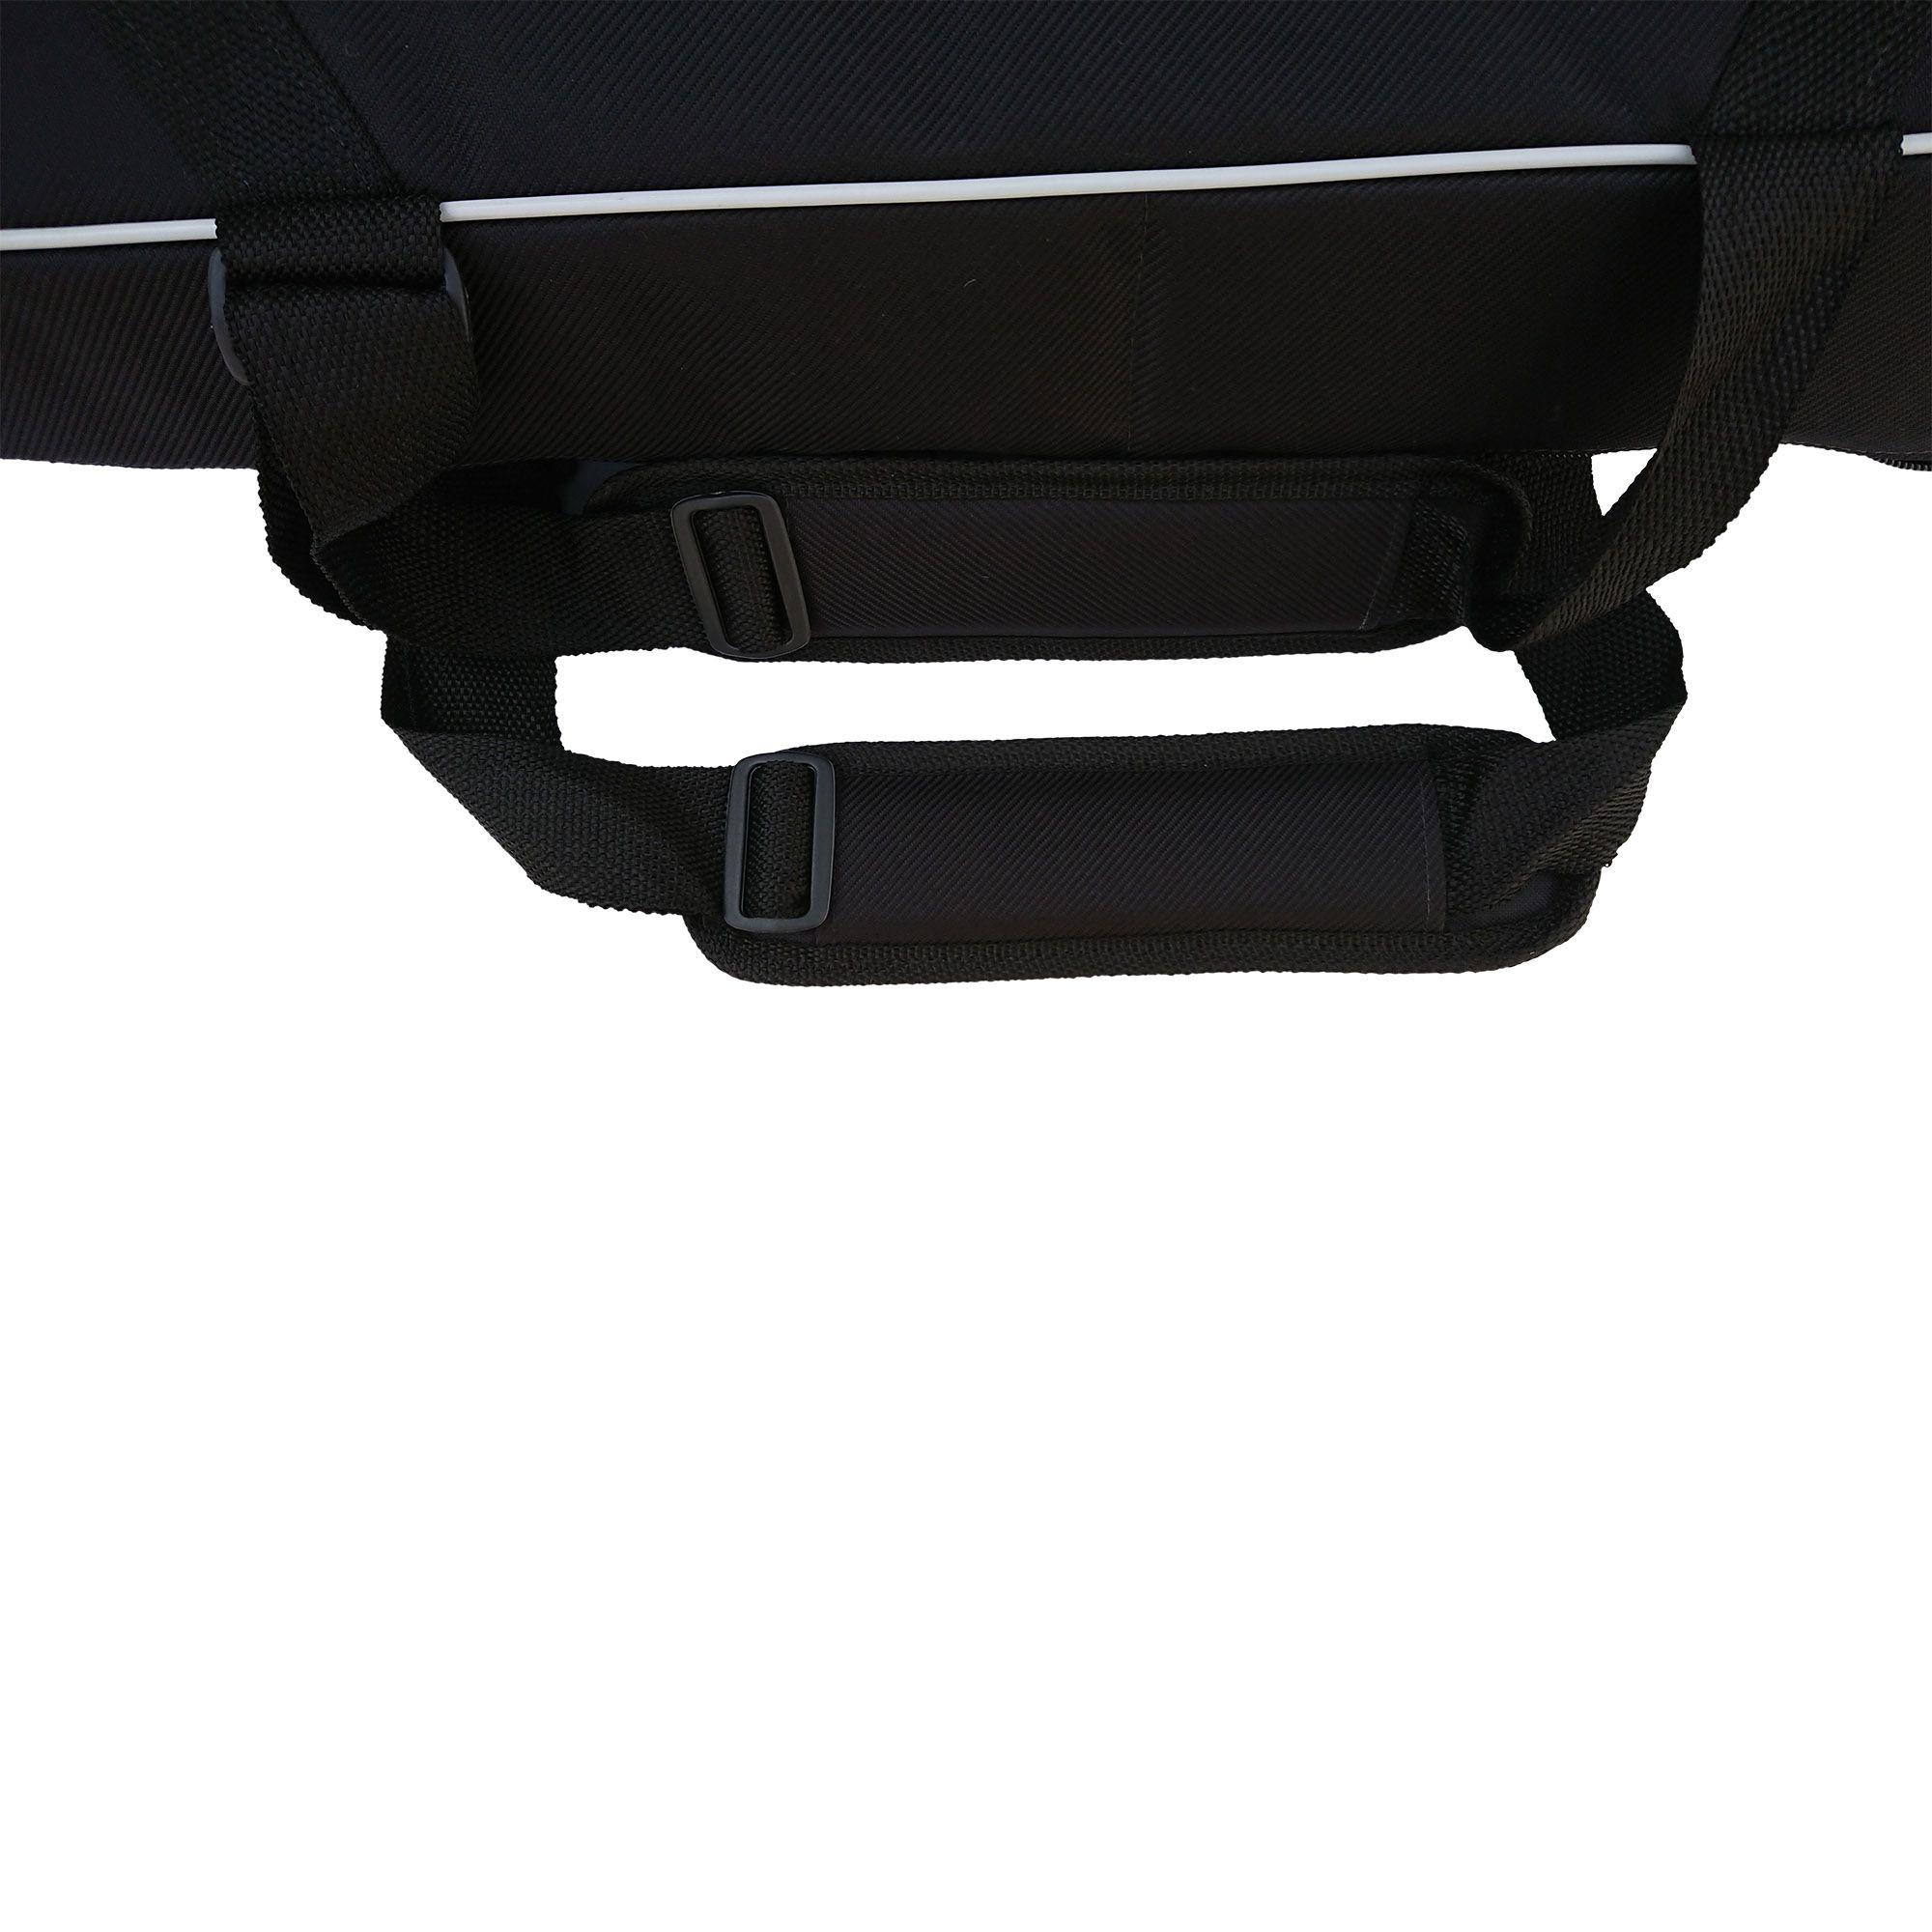 Capa Bag P/ Teclado 5/8 Semi Case Premium PSR S670, S910 MOTIF XS6 e Outros (100 x 45 x 18 cm) SC 402-A  - ROOSTERMUSIC